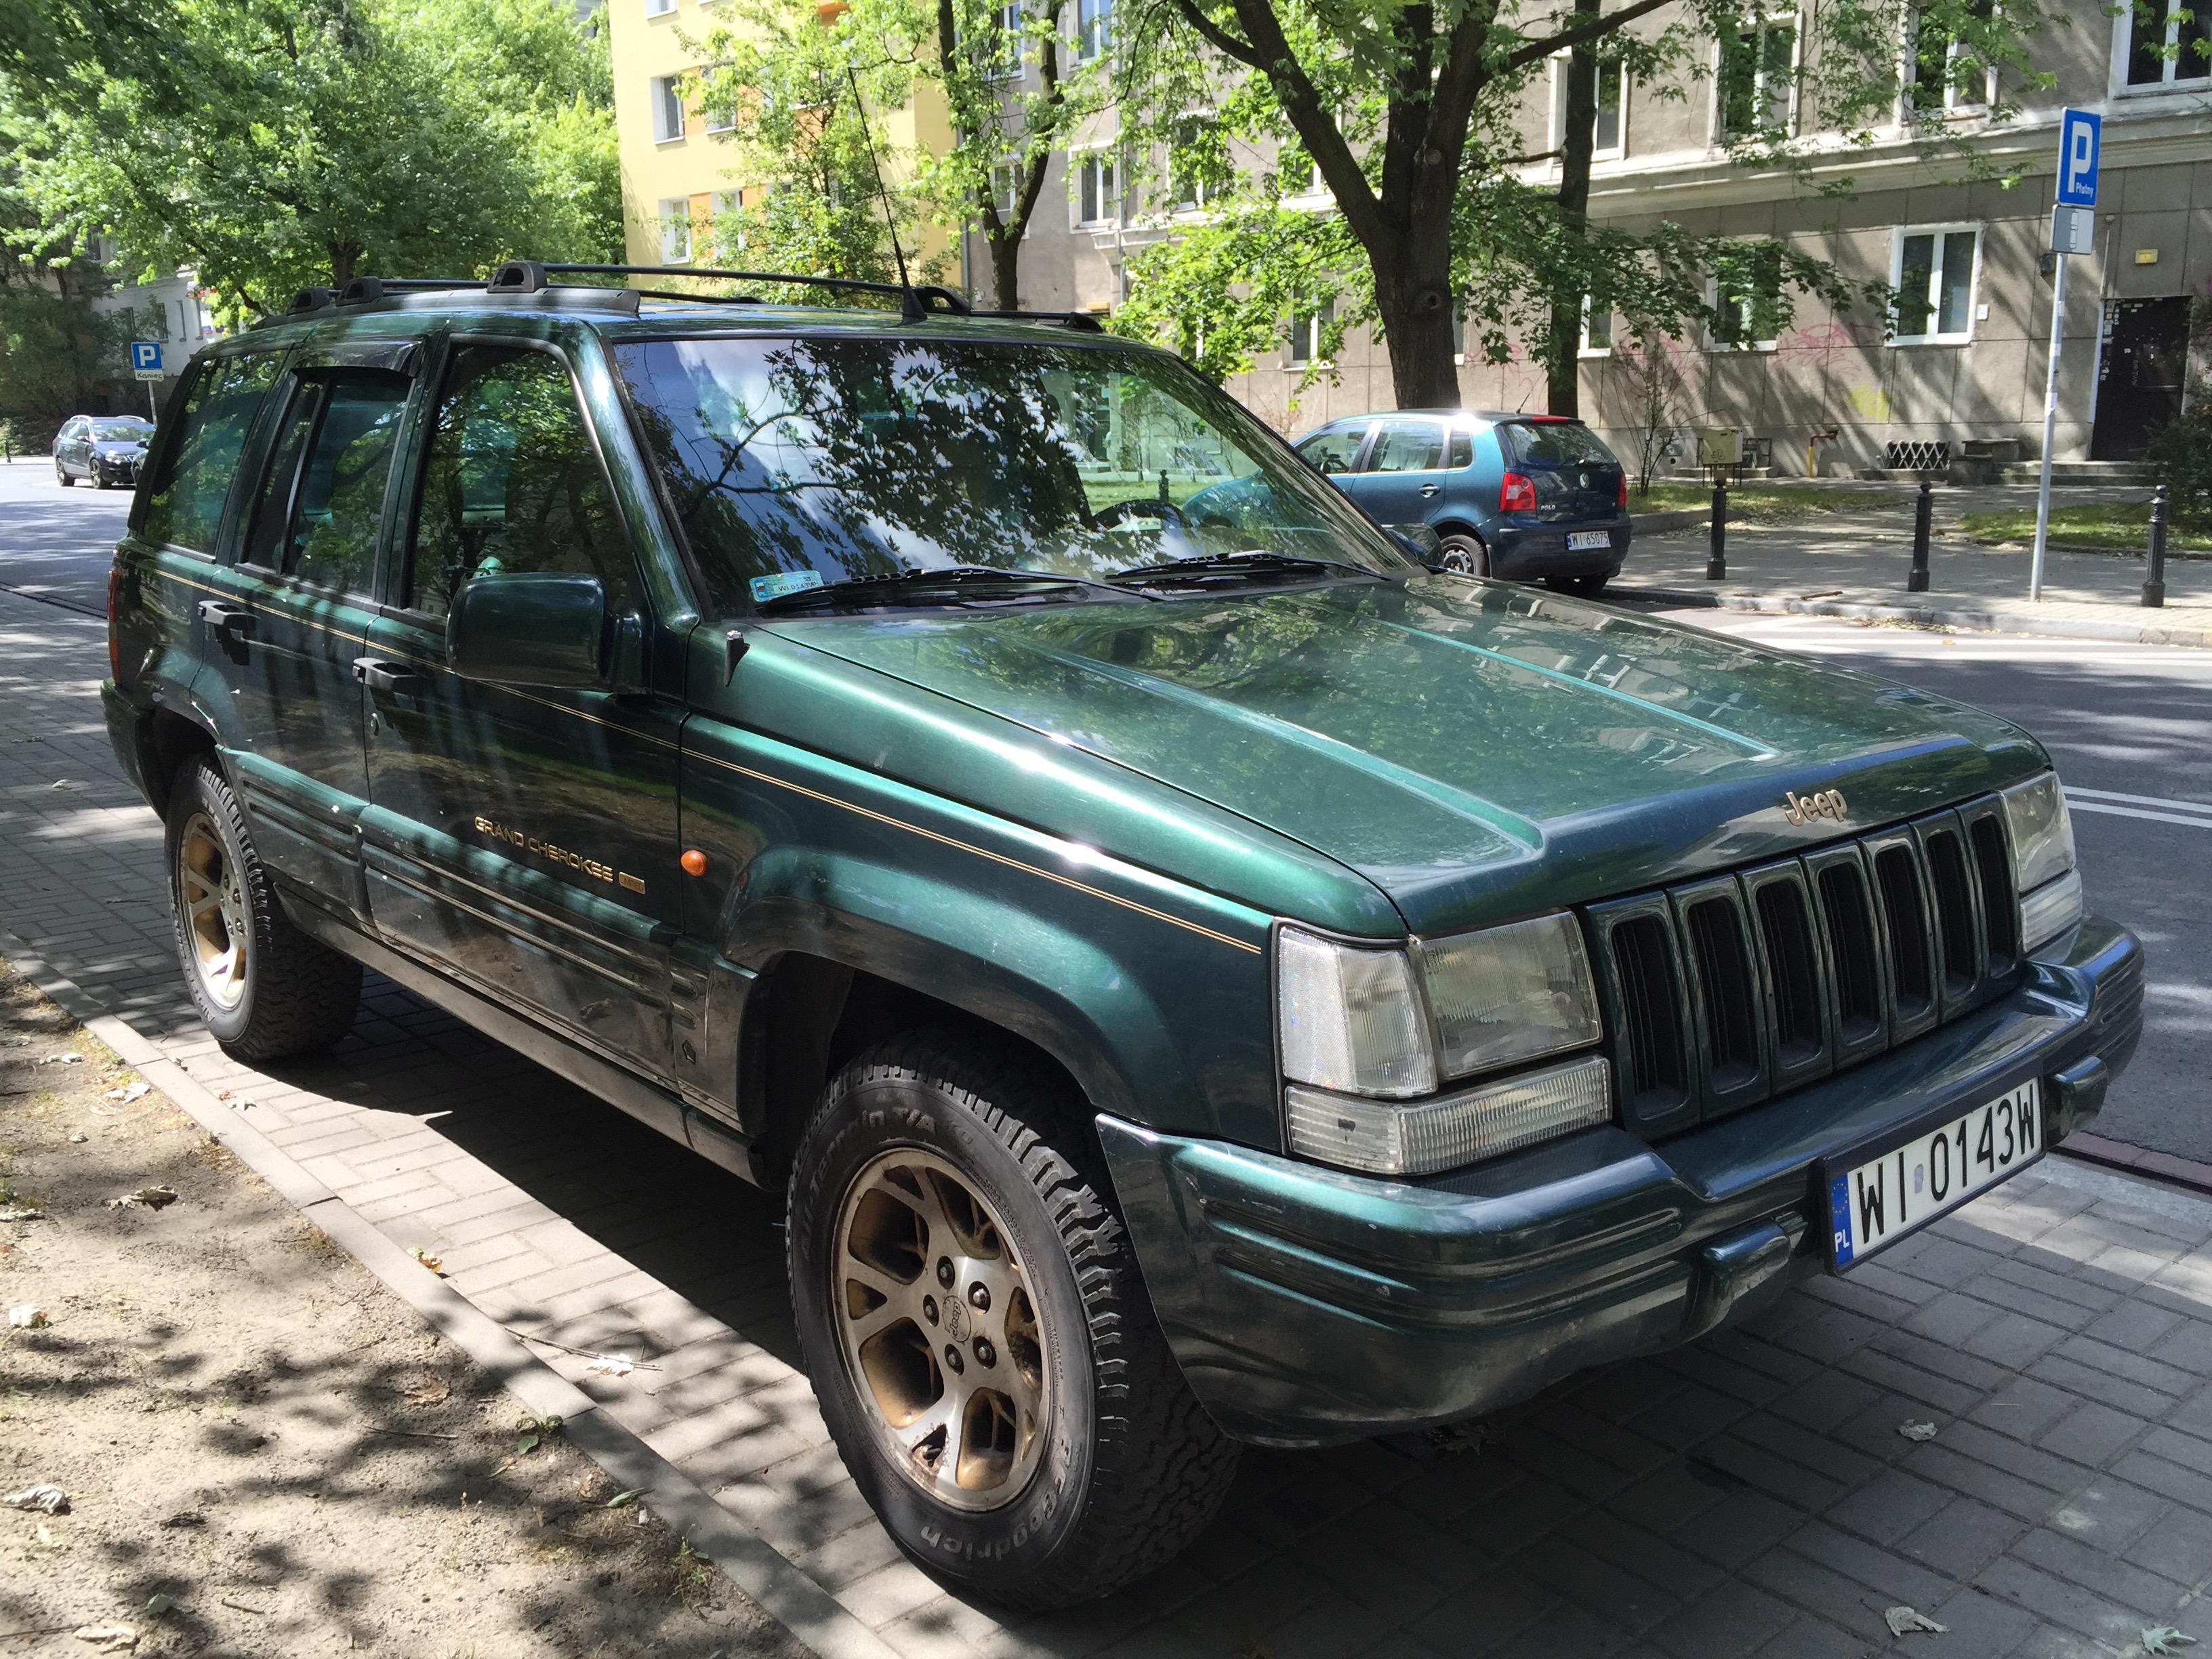 file:1996-1998 jeep grand cherokee limited green ulica ludwika